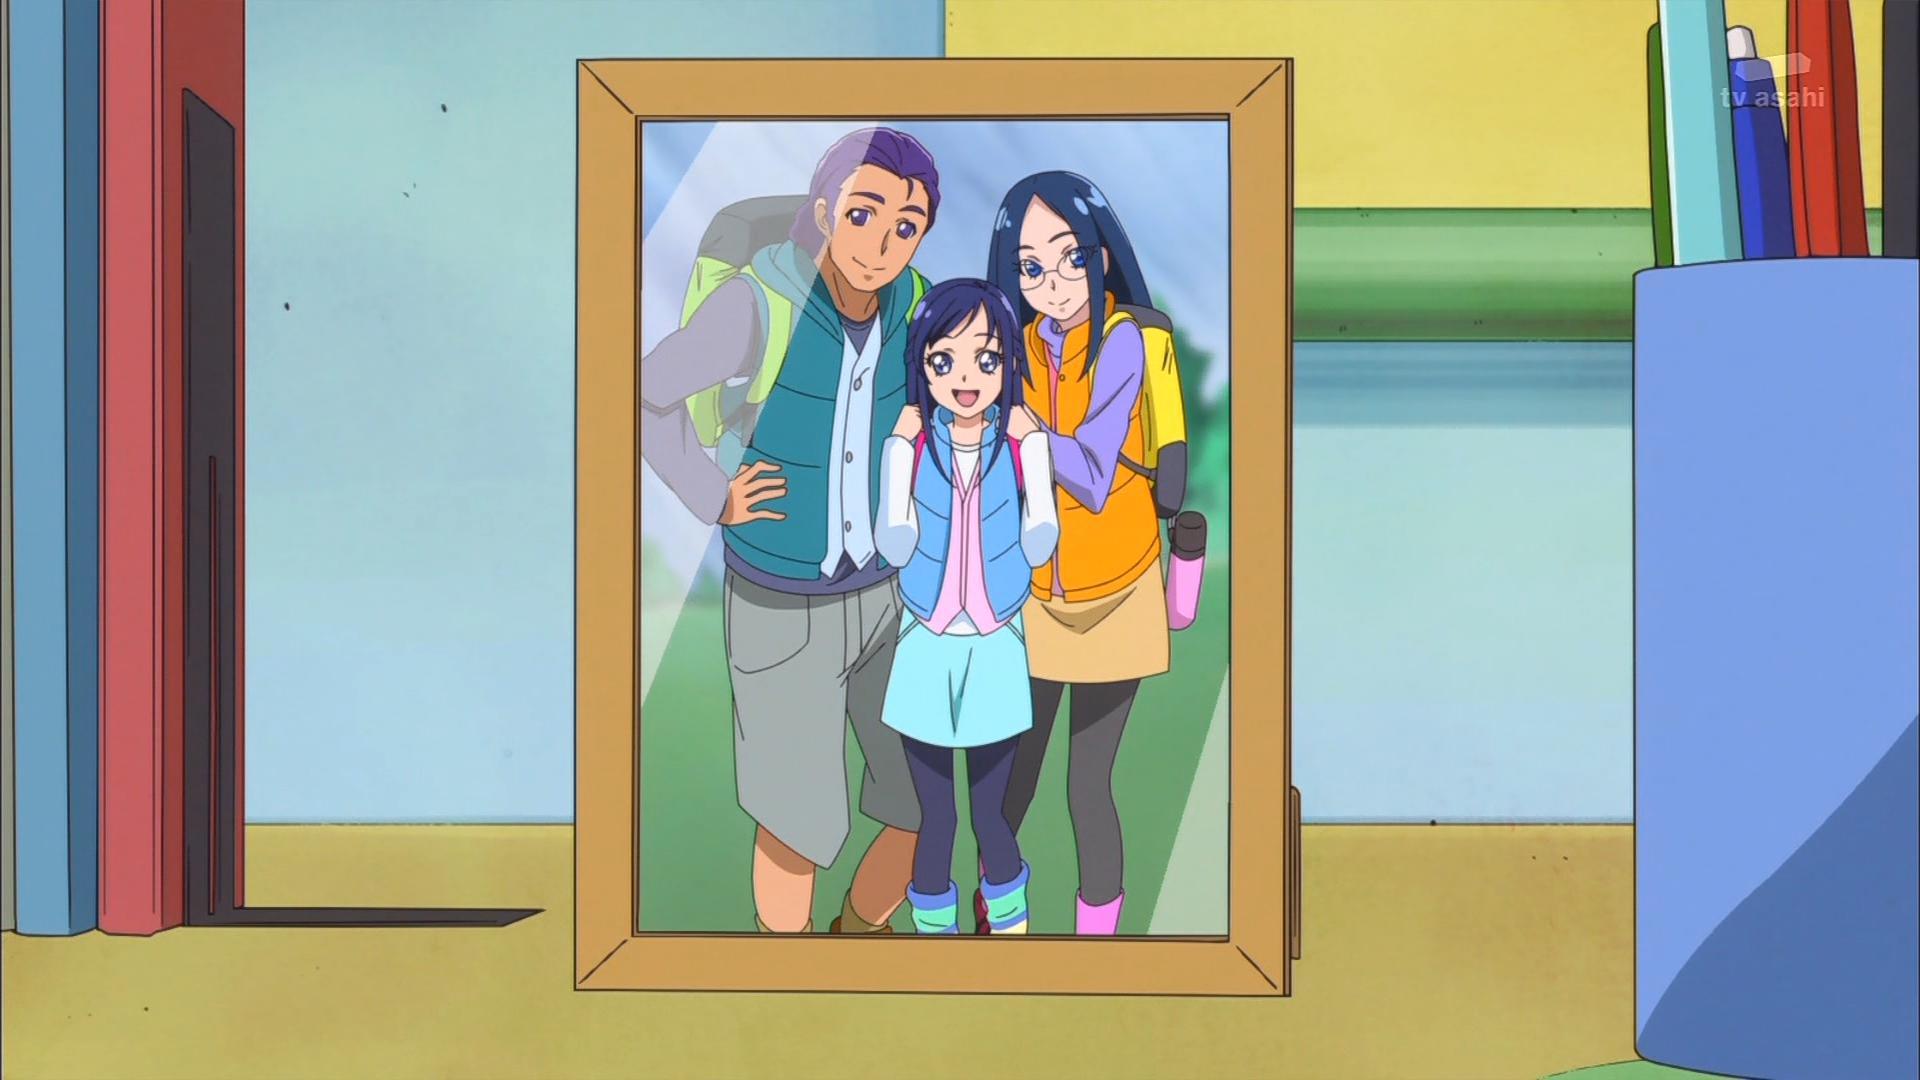 dkp03-hishikawafamily01.jpg